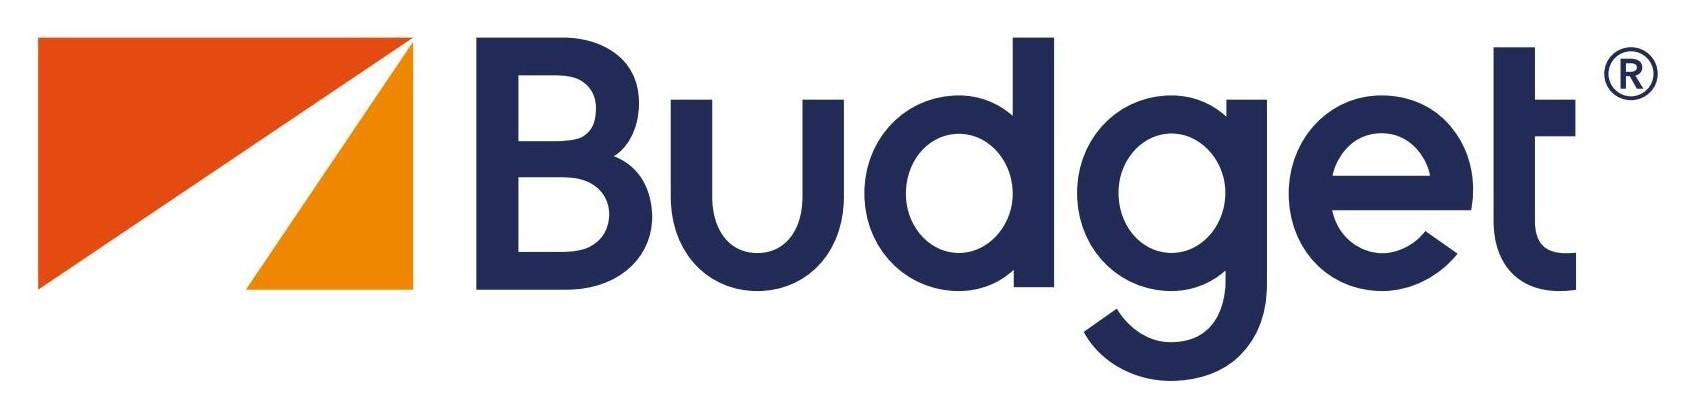 Budget Logo png